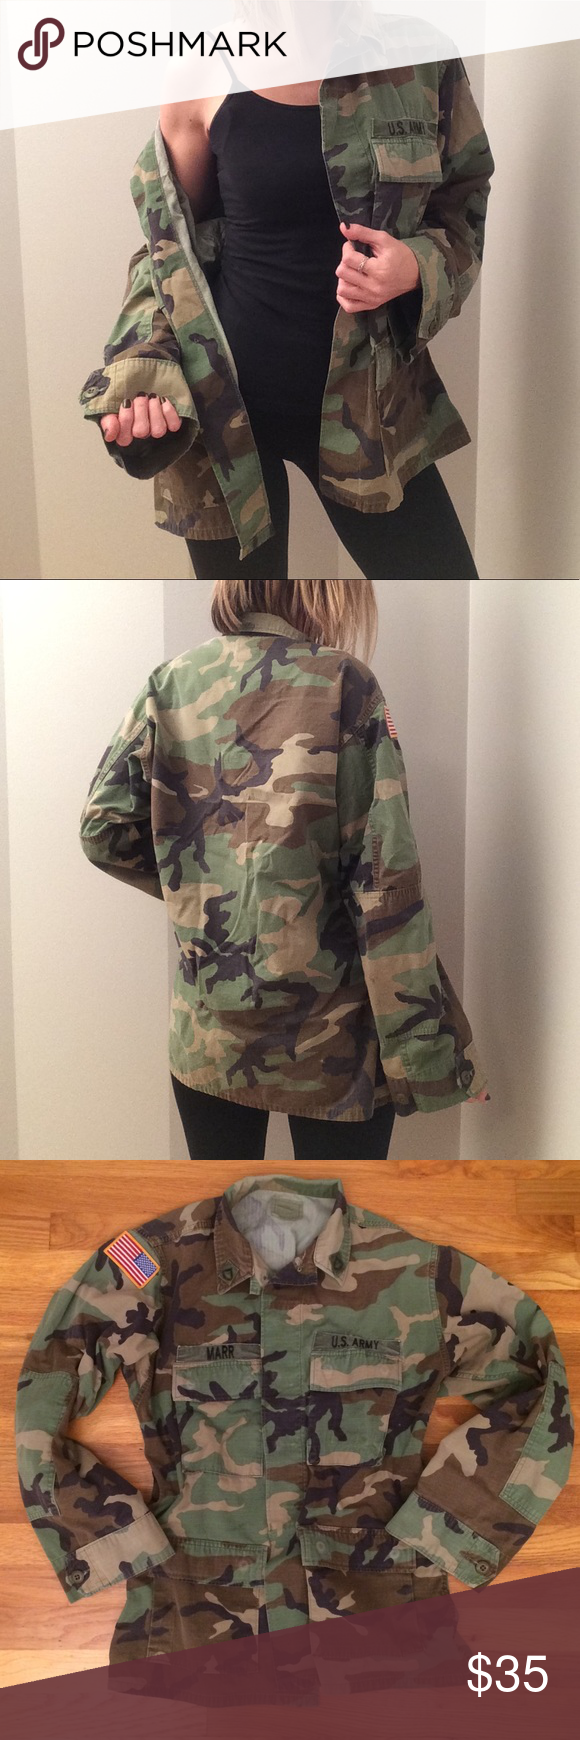 U S Army Baggy Oversized Camo Jacket Camo Jacket Clothes Design Fashion Design [ 1740 x 580 Pixel ]